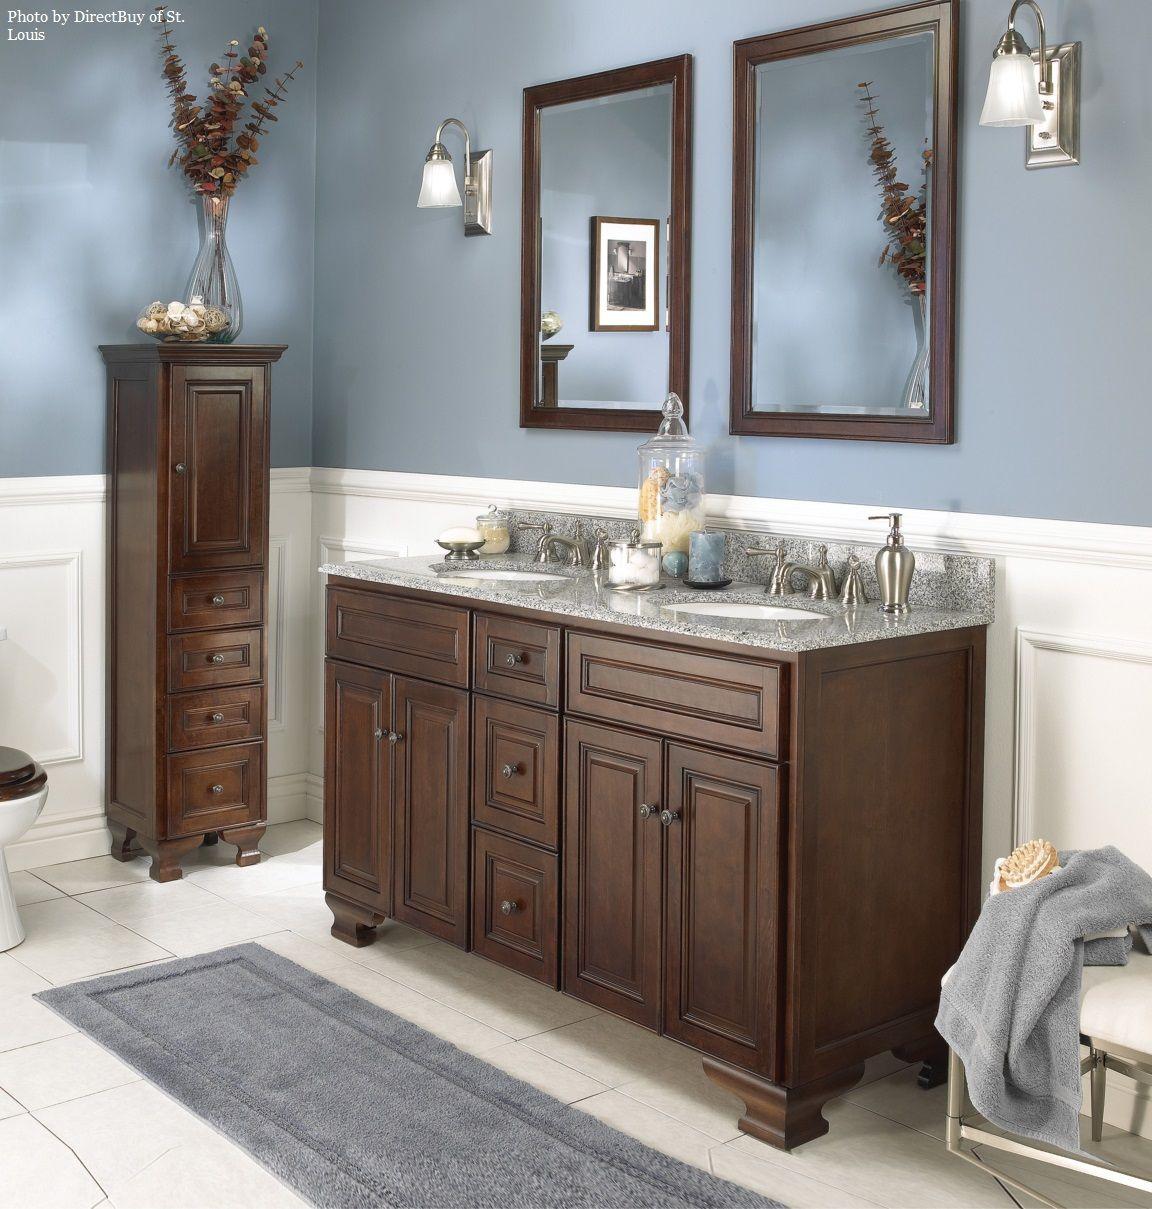 2021 2020 Bathroom Remodel Cost Average Renovation Cost Bathroom Wall Colors Bathroom Colors Bathroom Vanity [ 1209 x 1152 Pixel ]